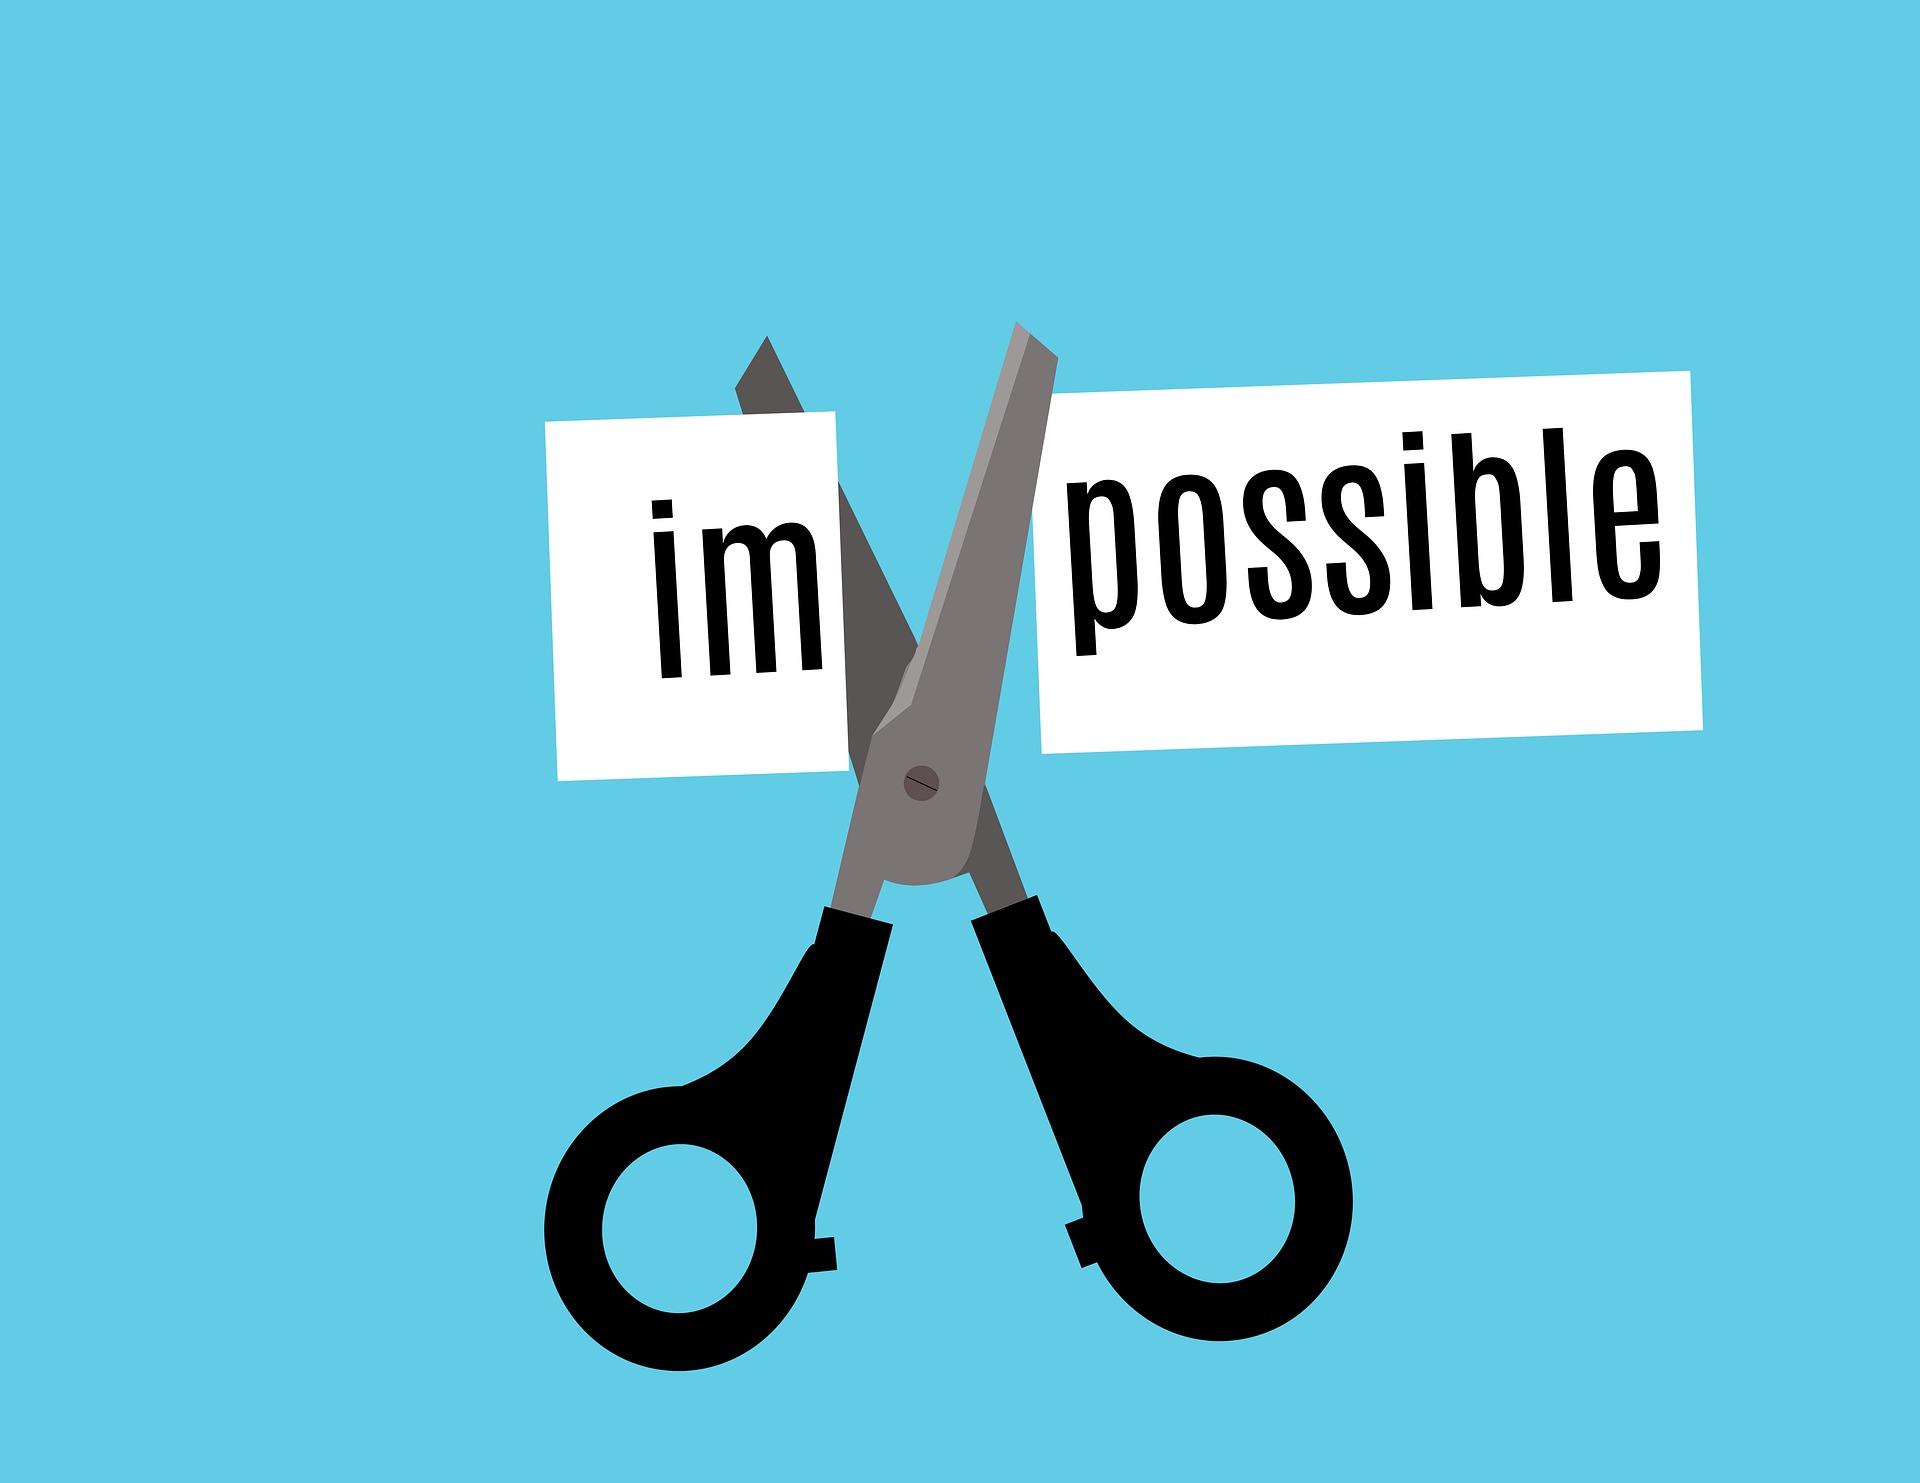 impossible 4505790 1920 15. Juni 2021